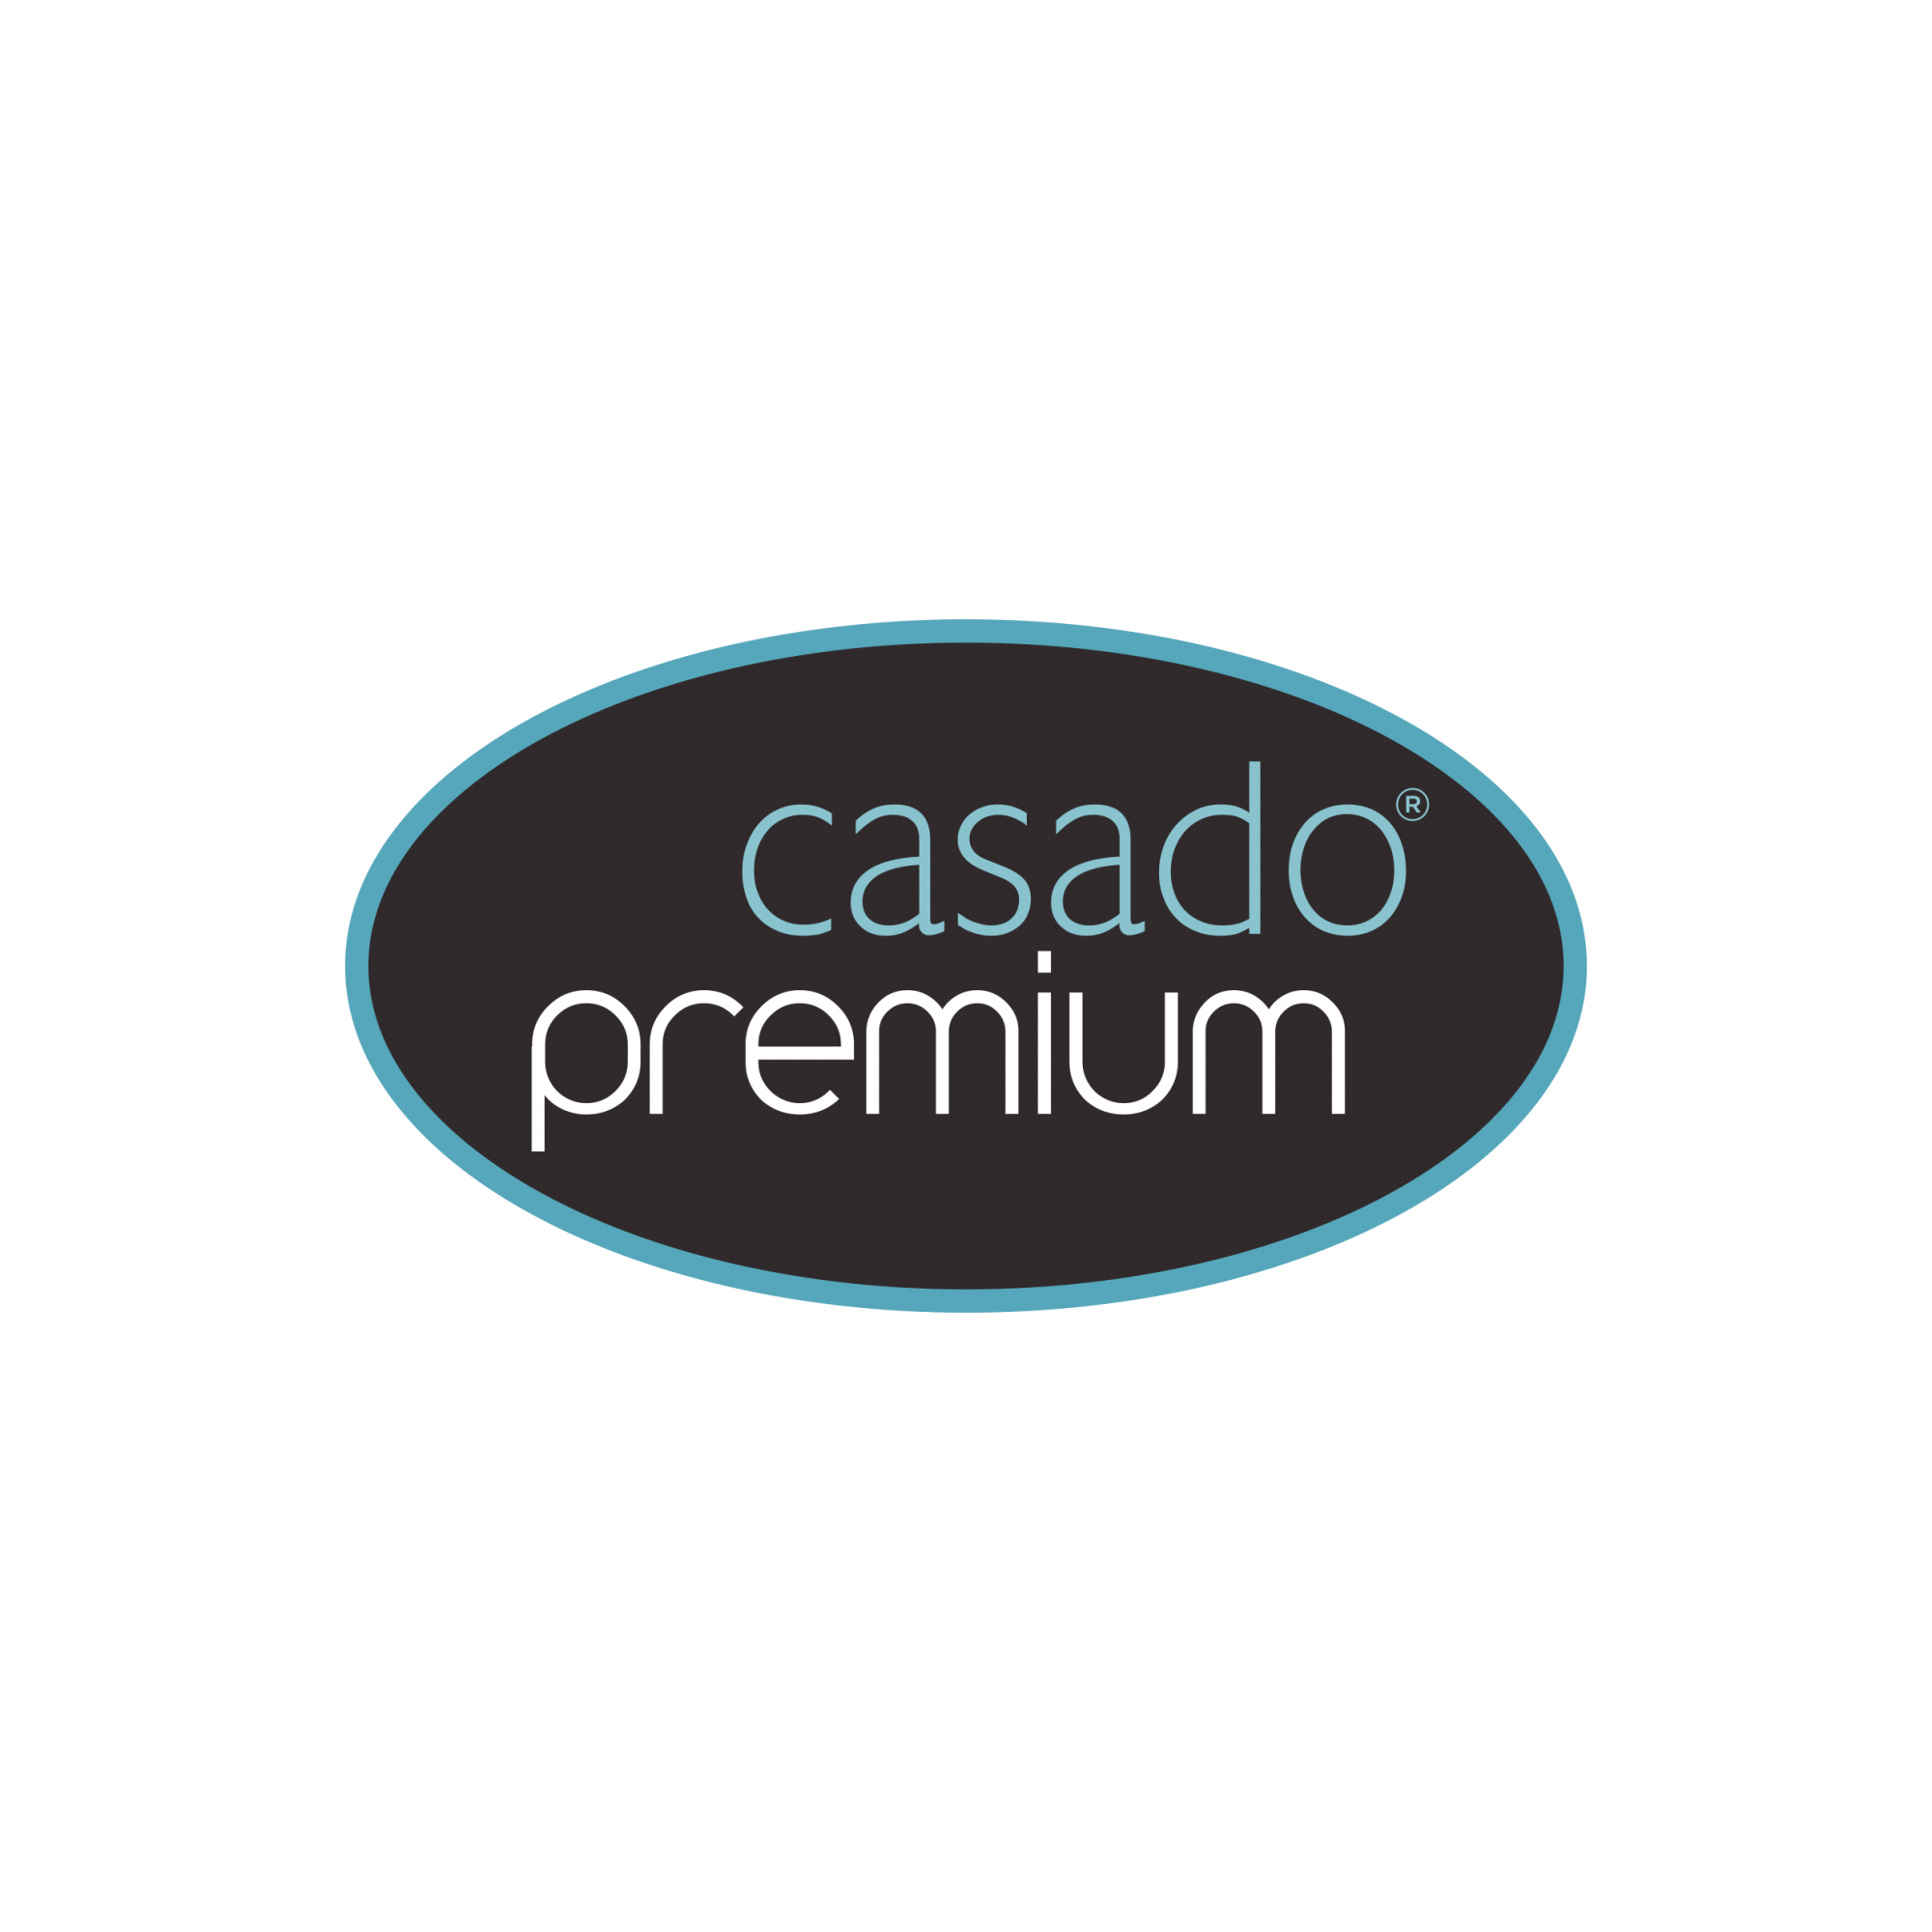 casado premium logo